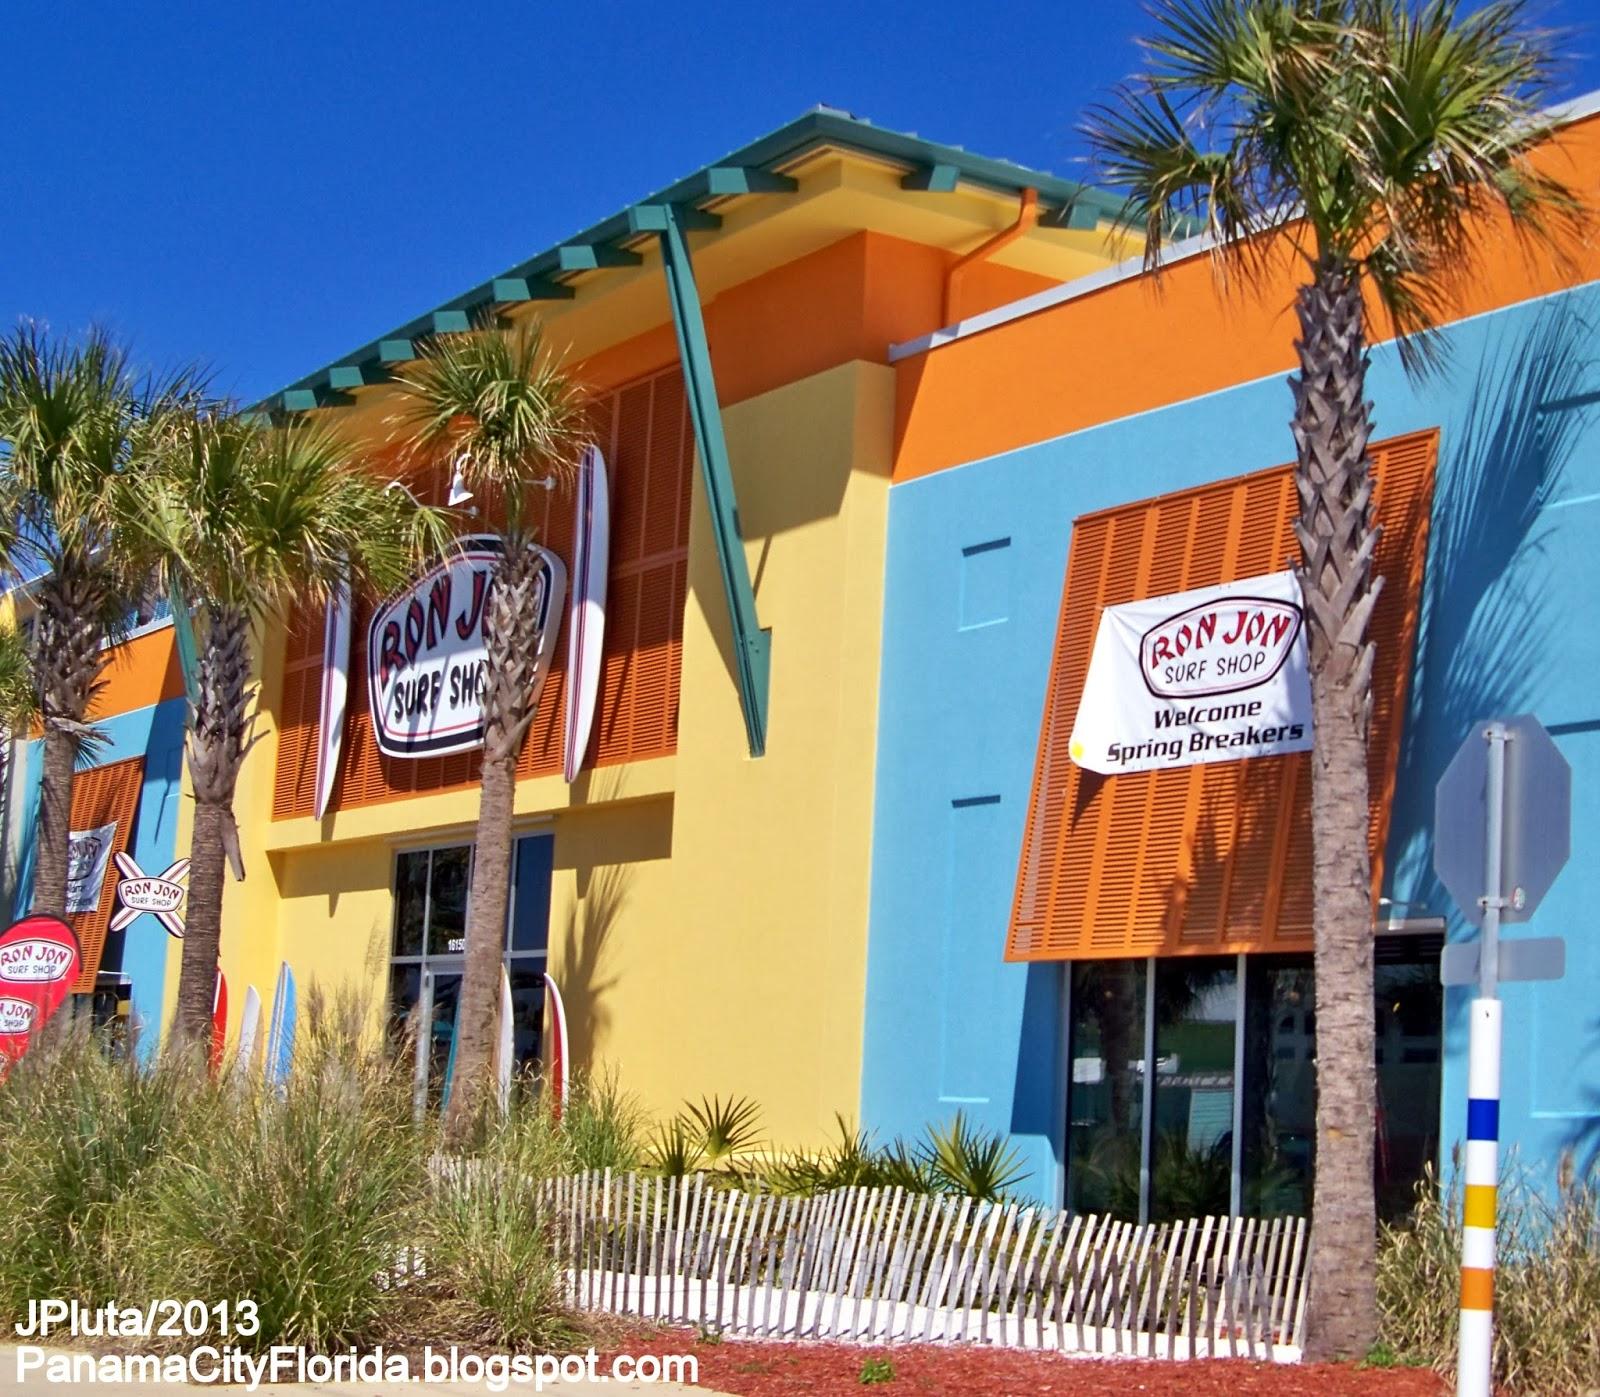 Furniture stores panama city beach fl - Ron Jon Panama City Beach Florida Pier Park Front Beach Road Surf Shop Surfboards Spring Break Store Ron Jon Surf Shop Panama City Beach Fl Pcb Fla